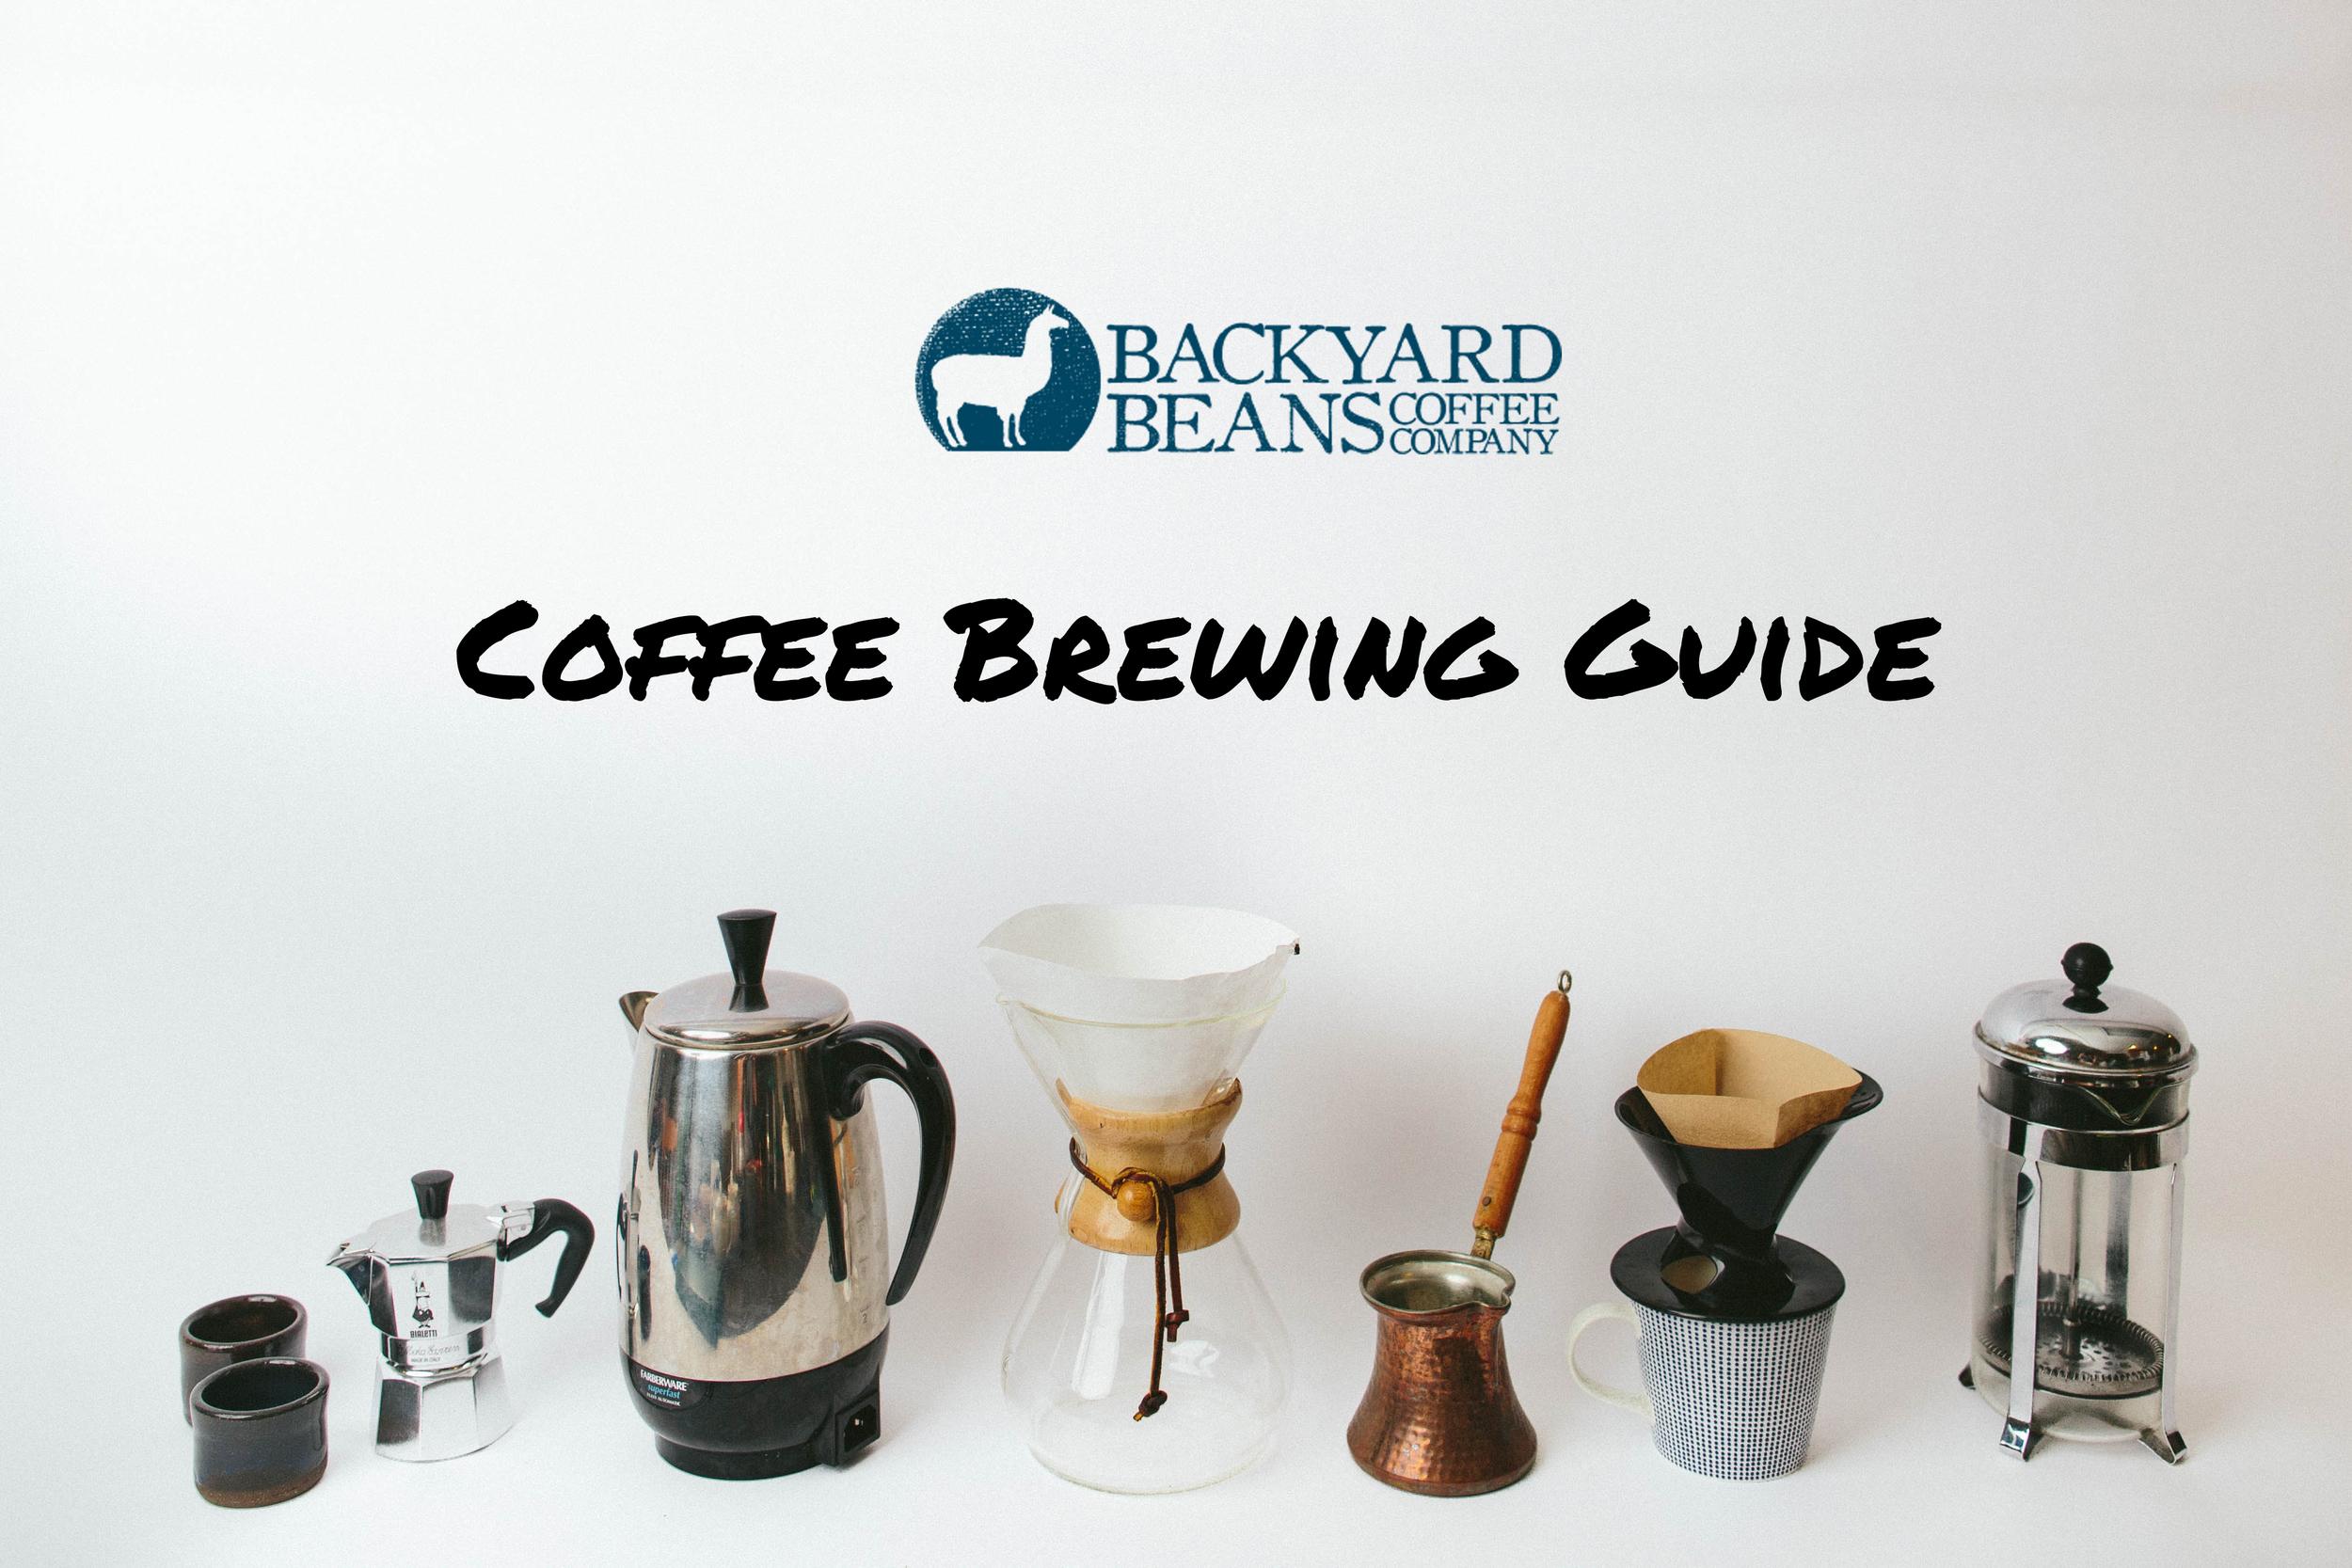 BACKYARD BEANS, COFFEE BREWING GUIDE.